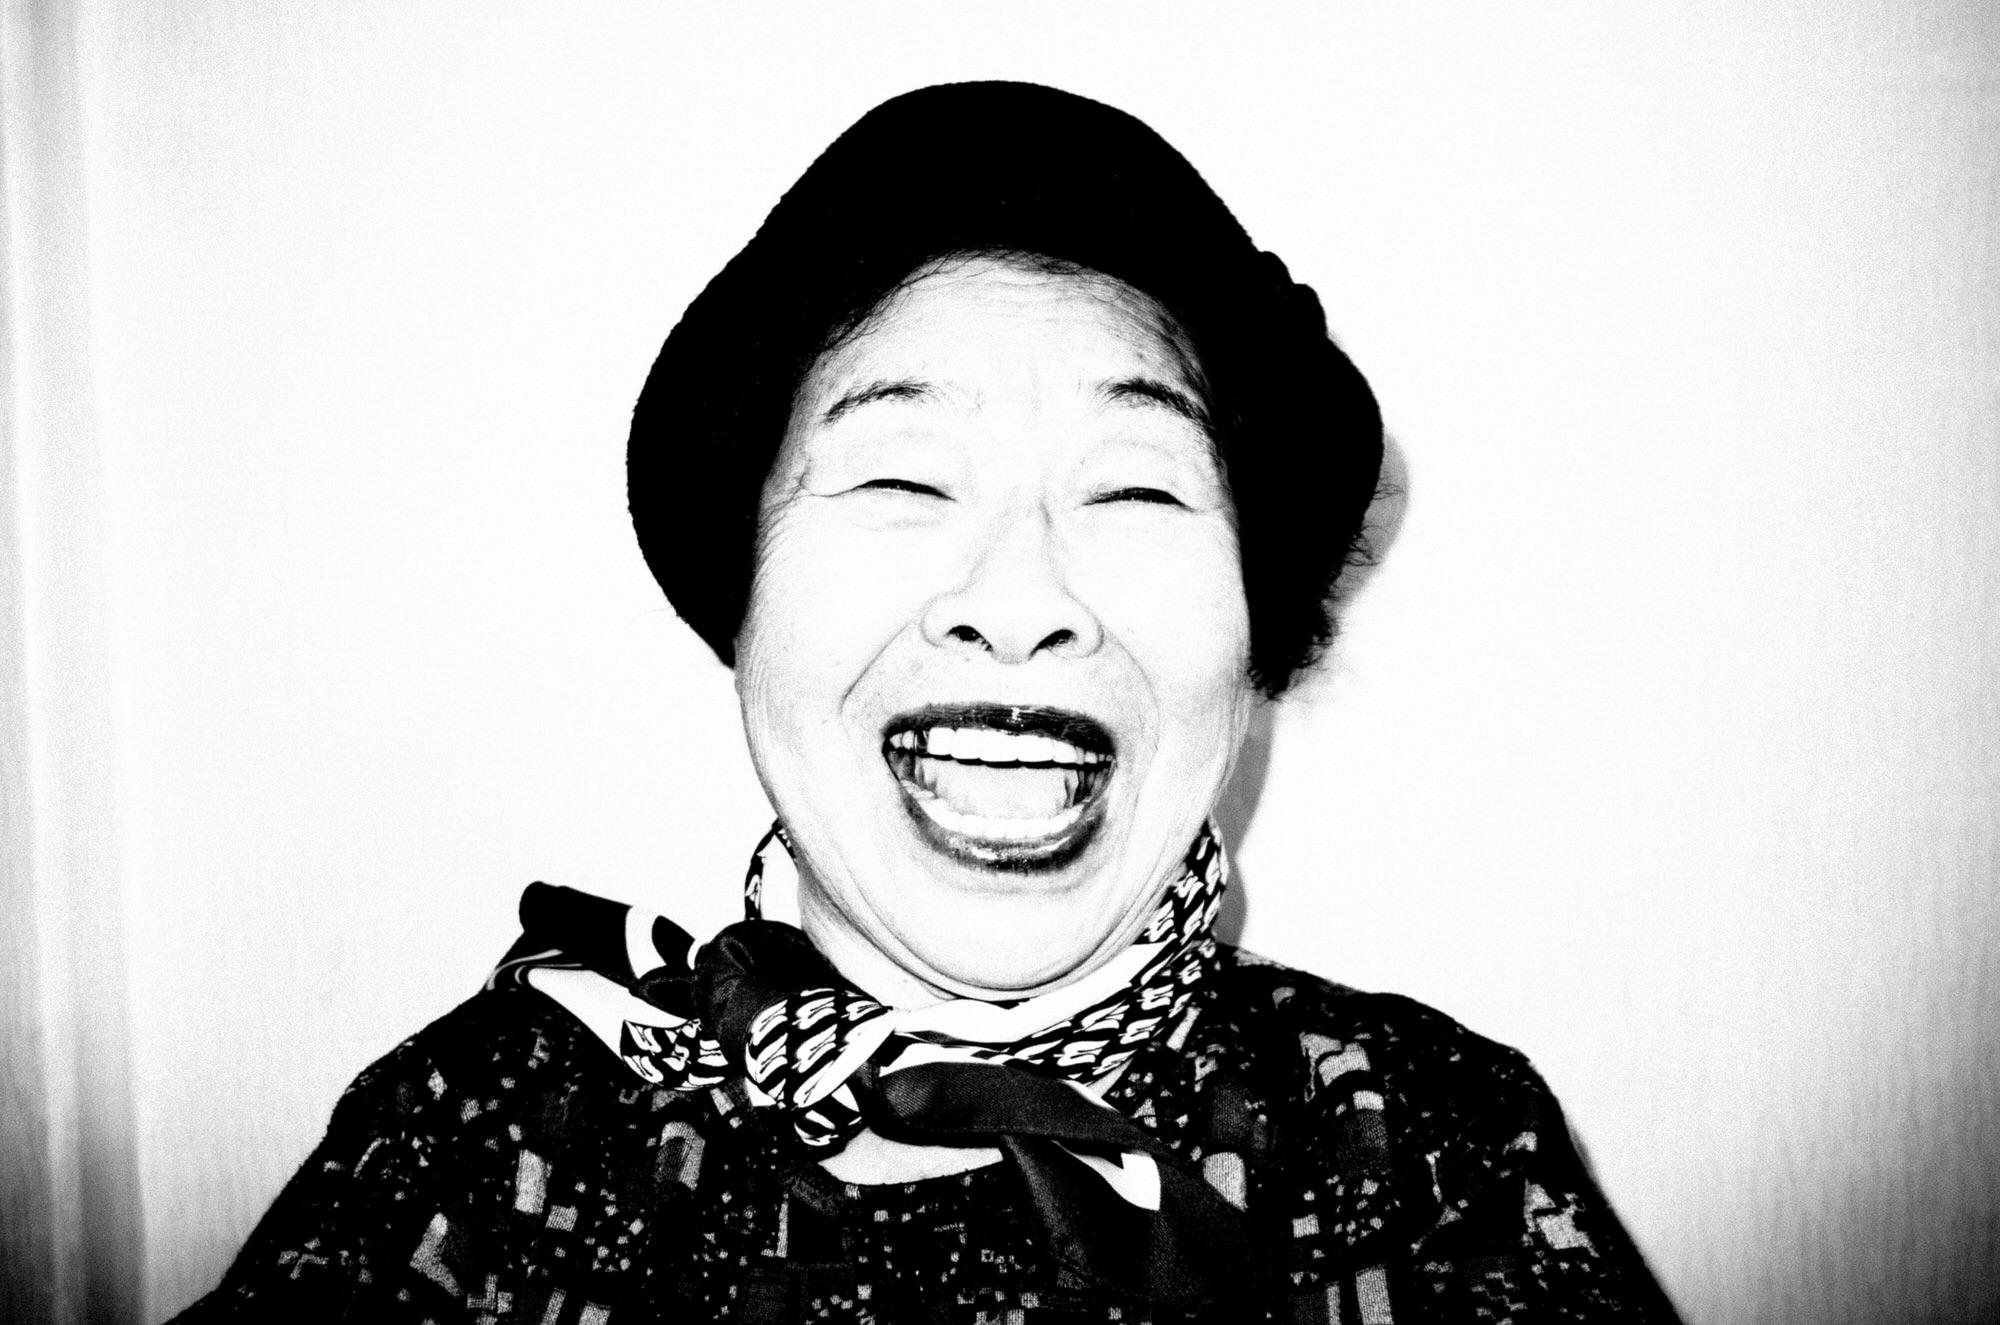 eric kim photography black and white - halmunee-grandma-eric kim photography seoul-0003562-2